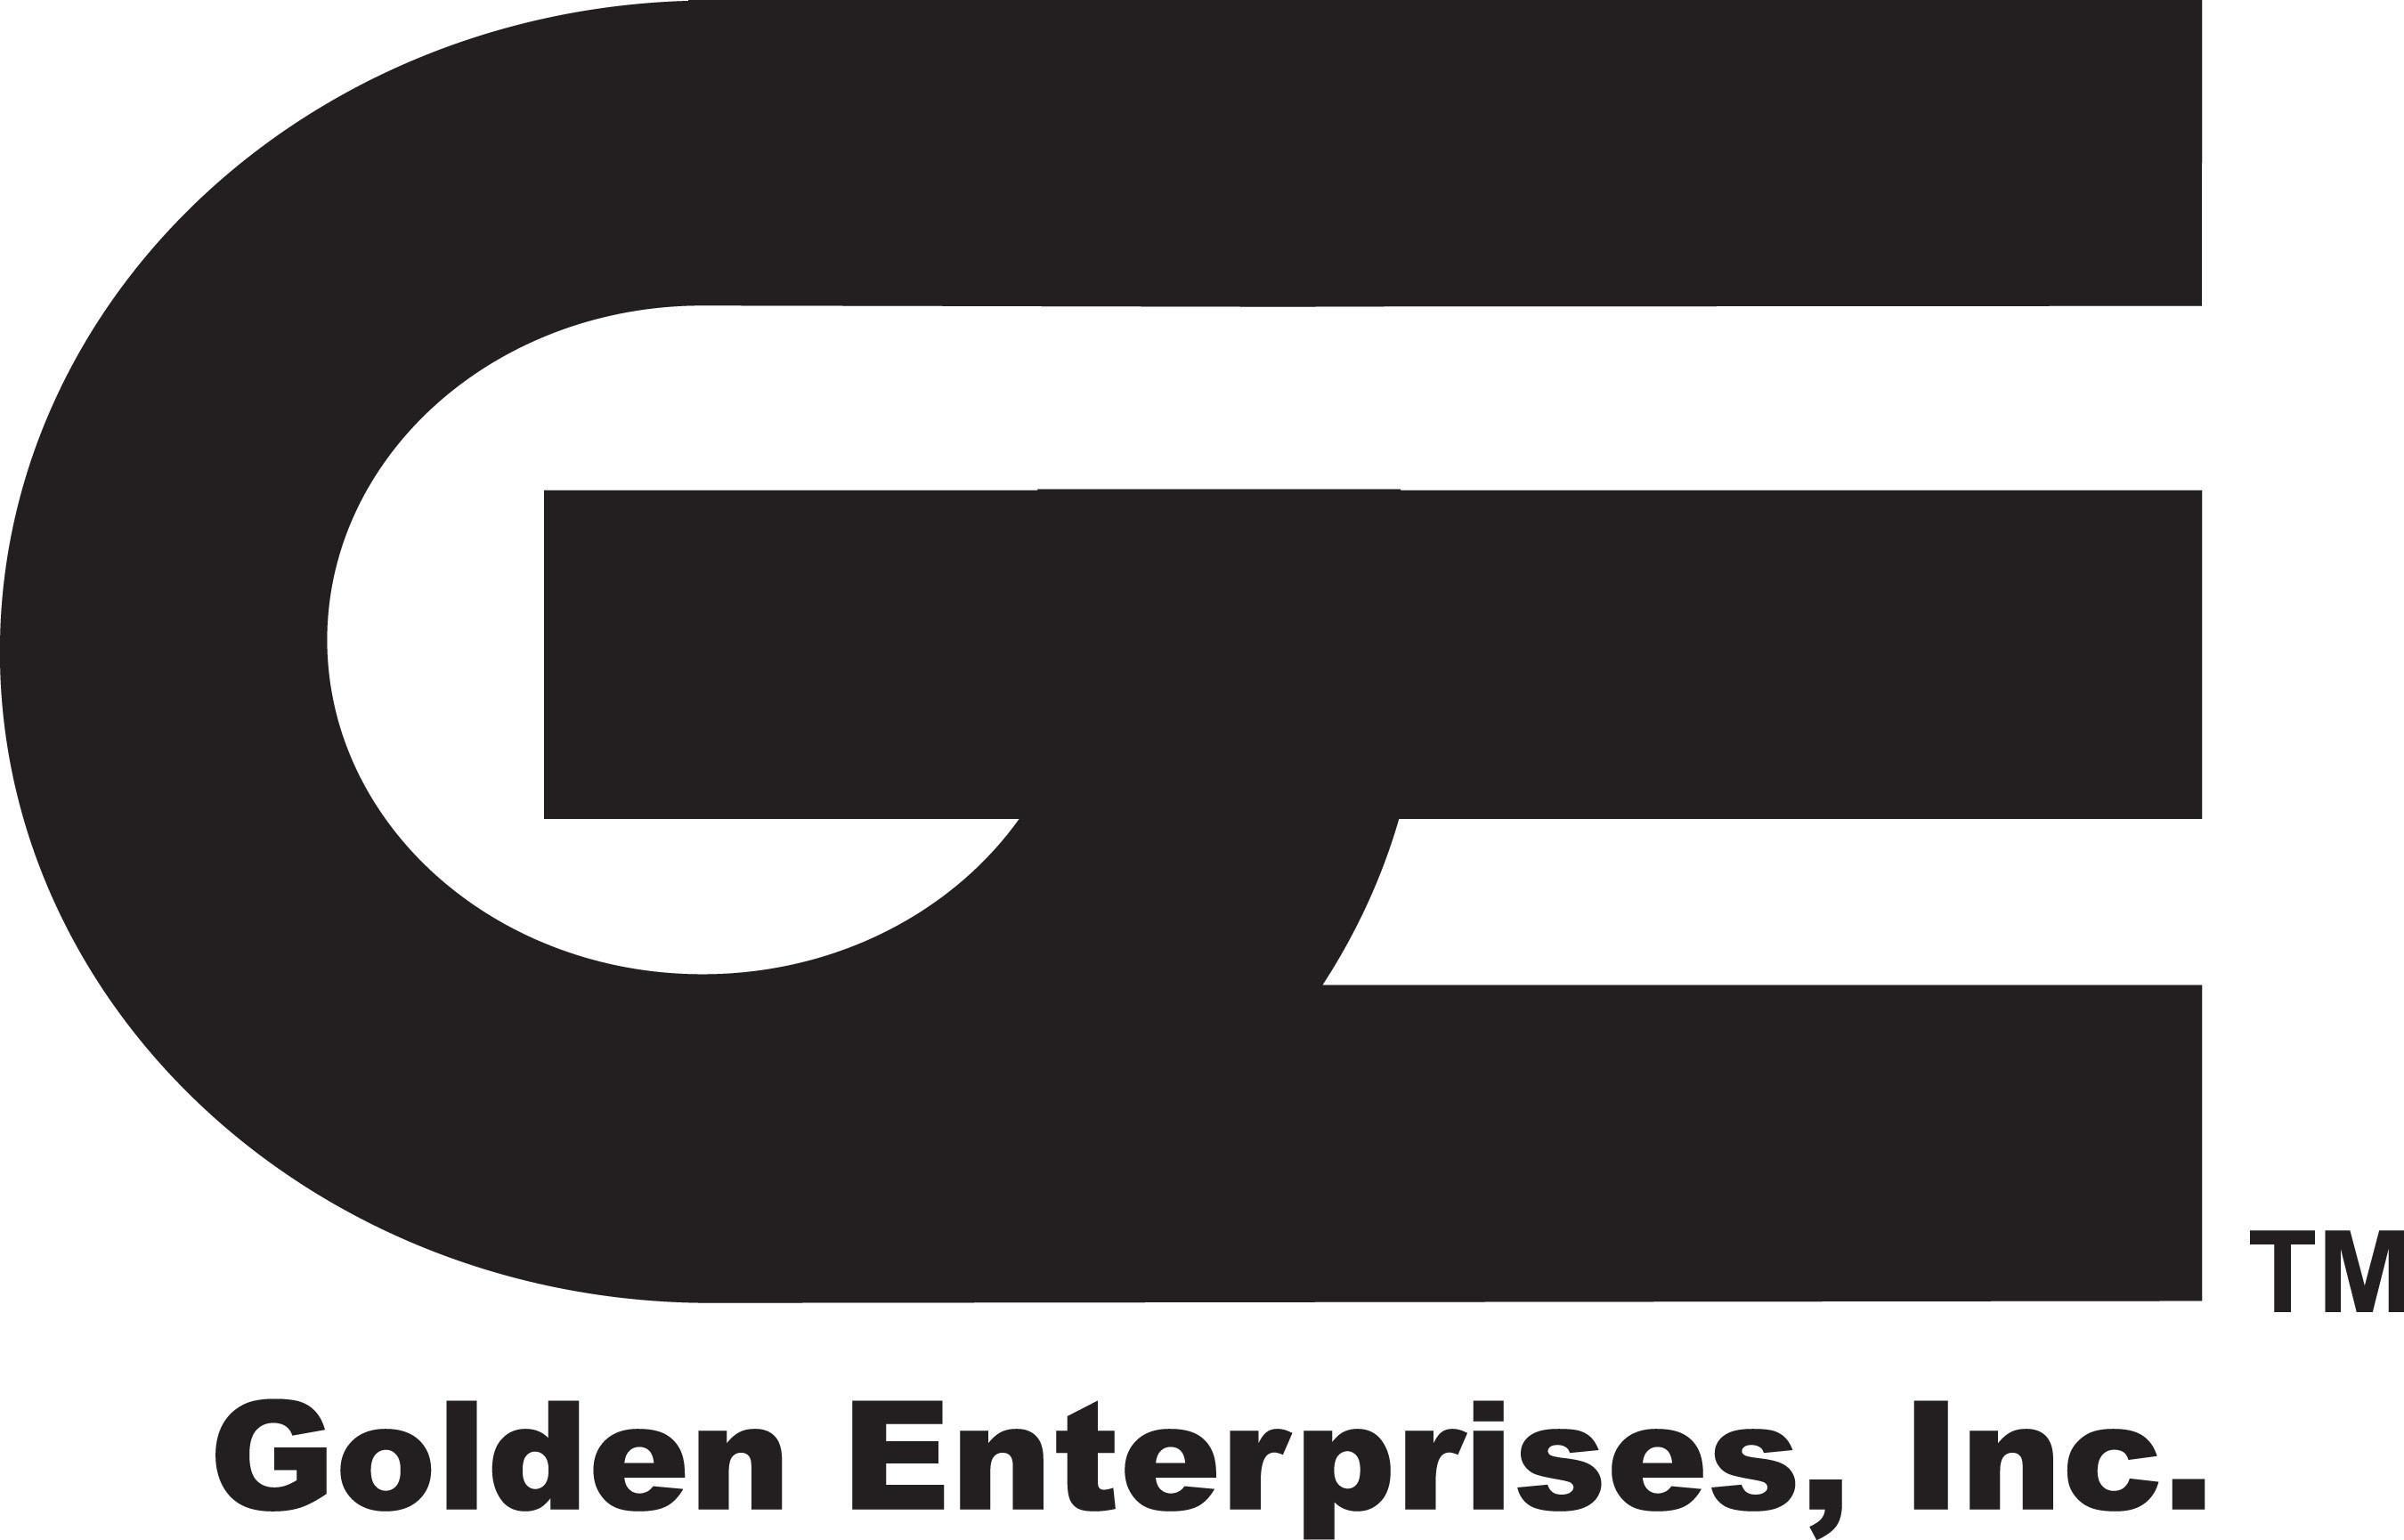 Golden Enterprises Inc And Utz Quality Foods Inc Of Hanover